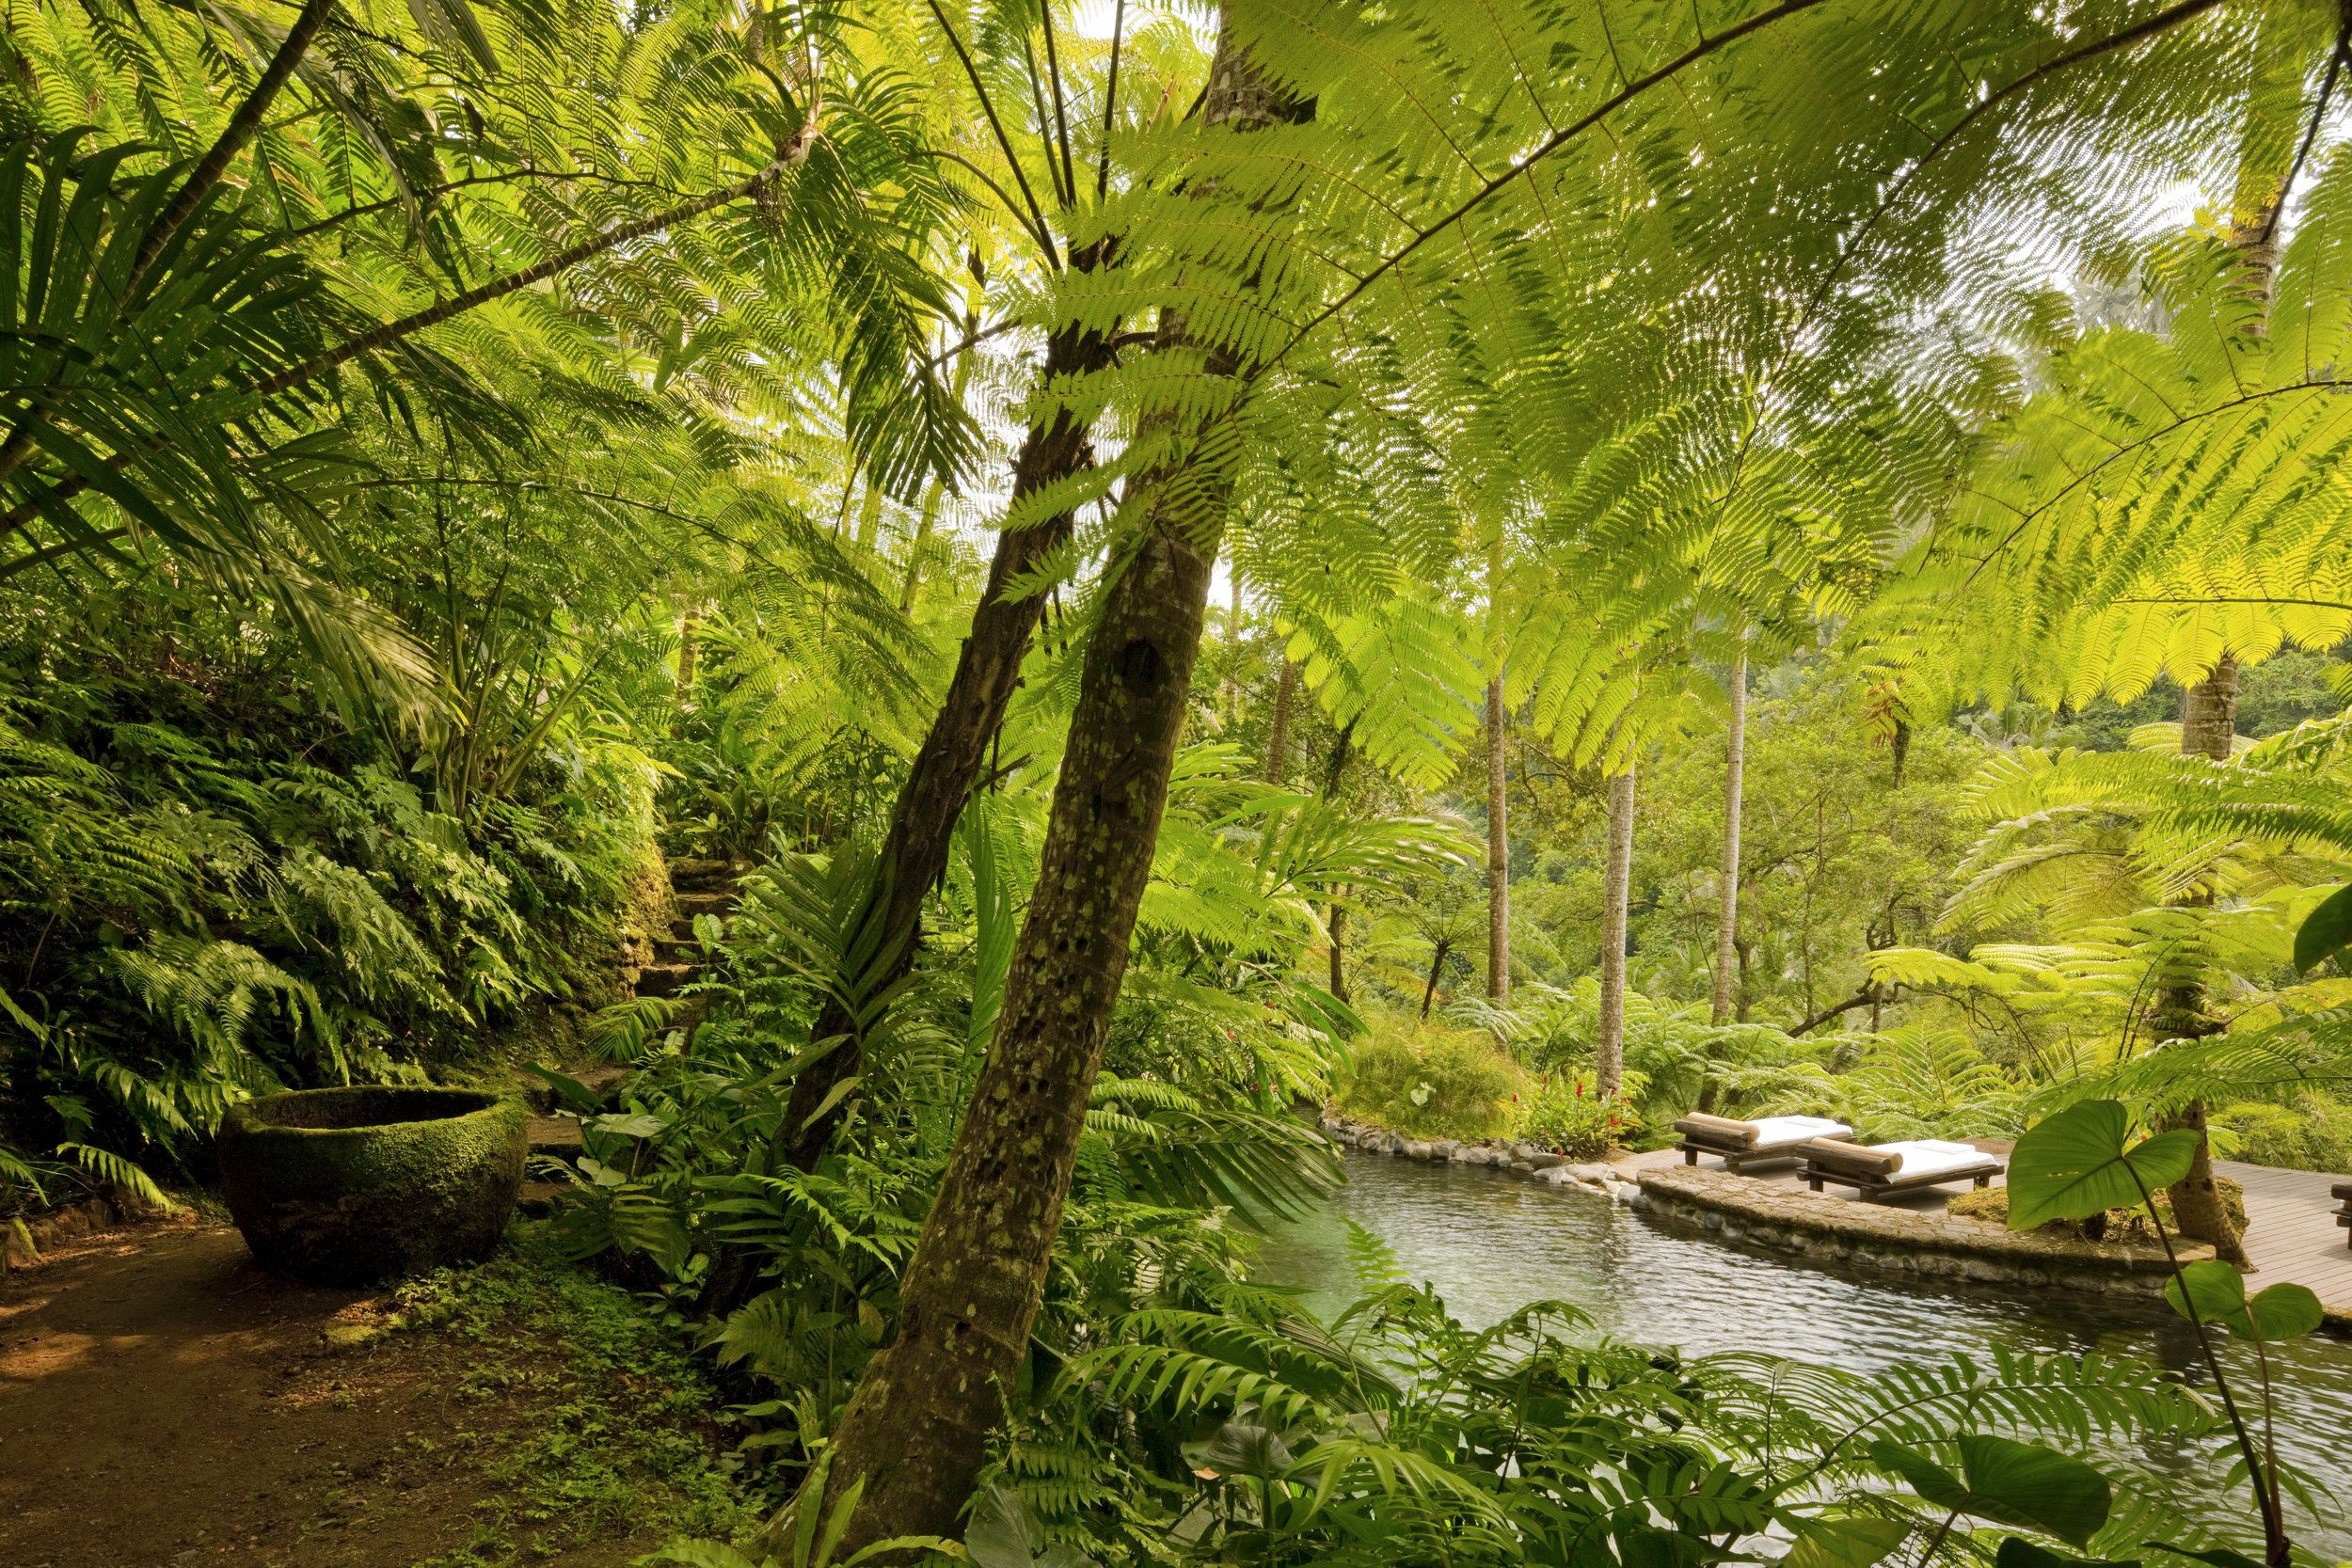 44164755-H1-Kedara_(Water_Garden)_1.jpg